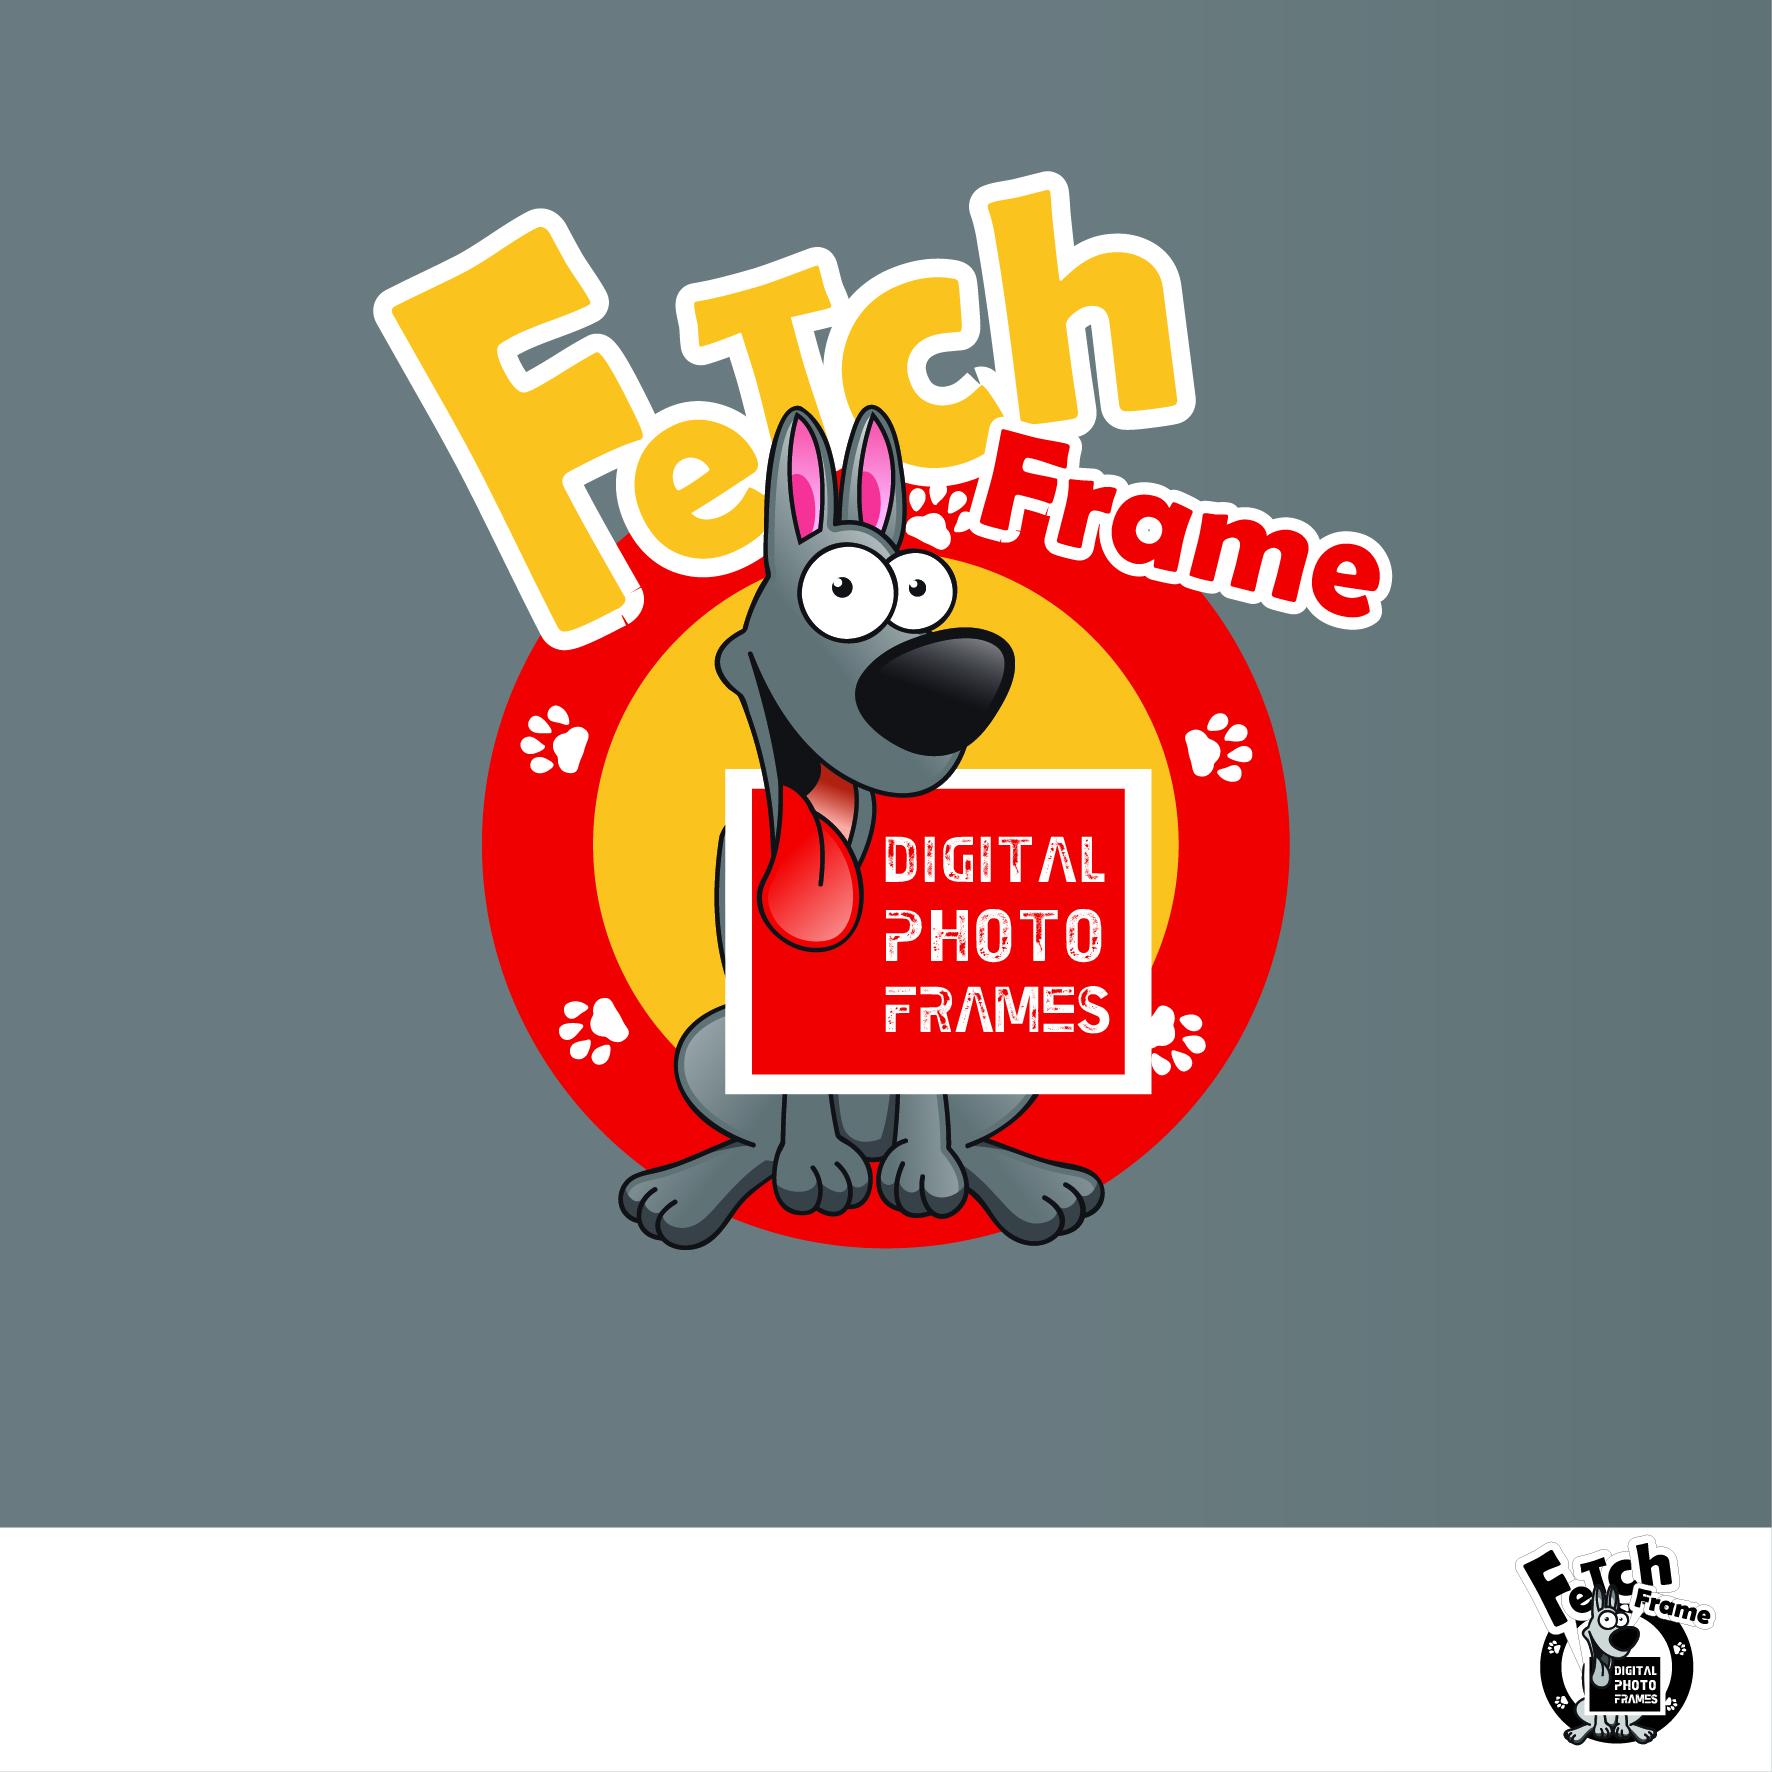 Logo Design by nTia - Entry No. 22 in the Logo Design Contest New Logo Design for FetchFrame.